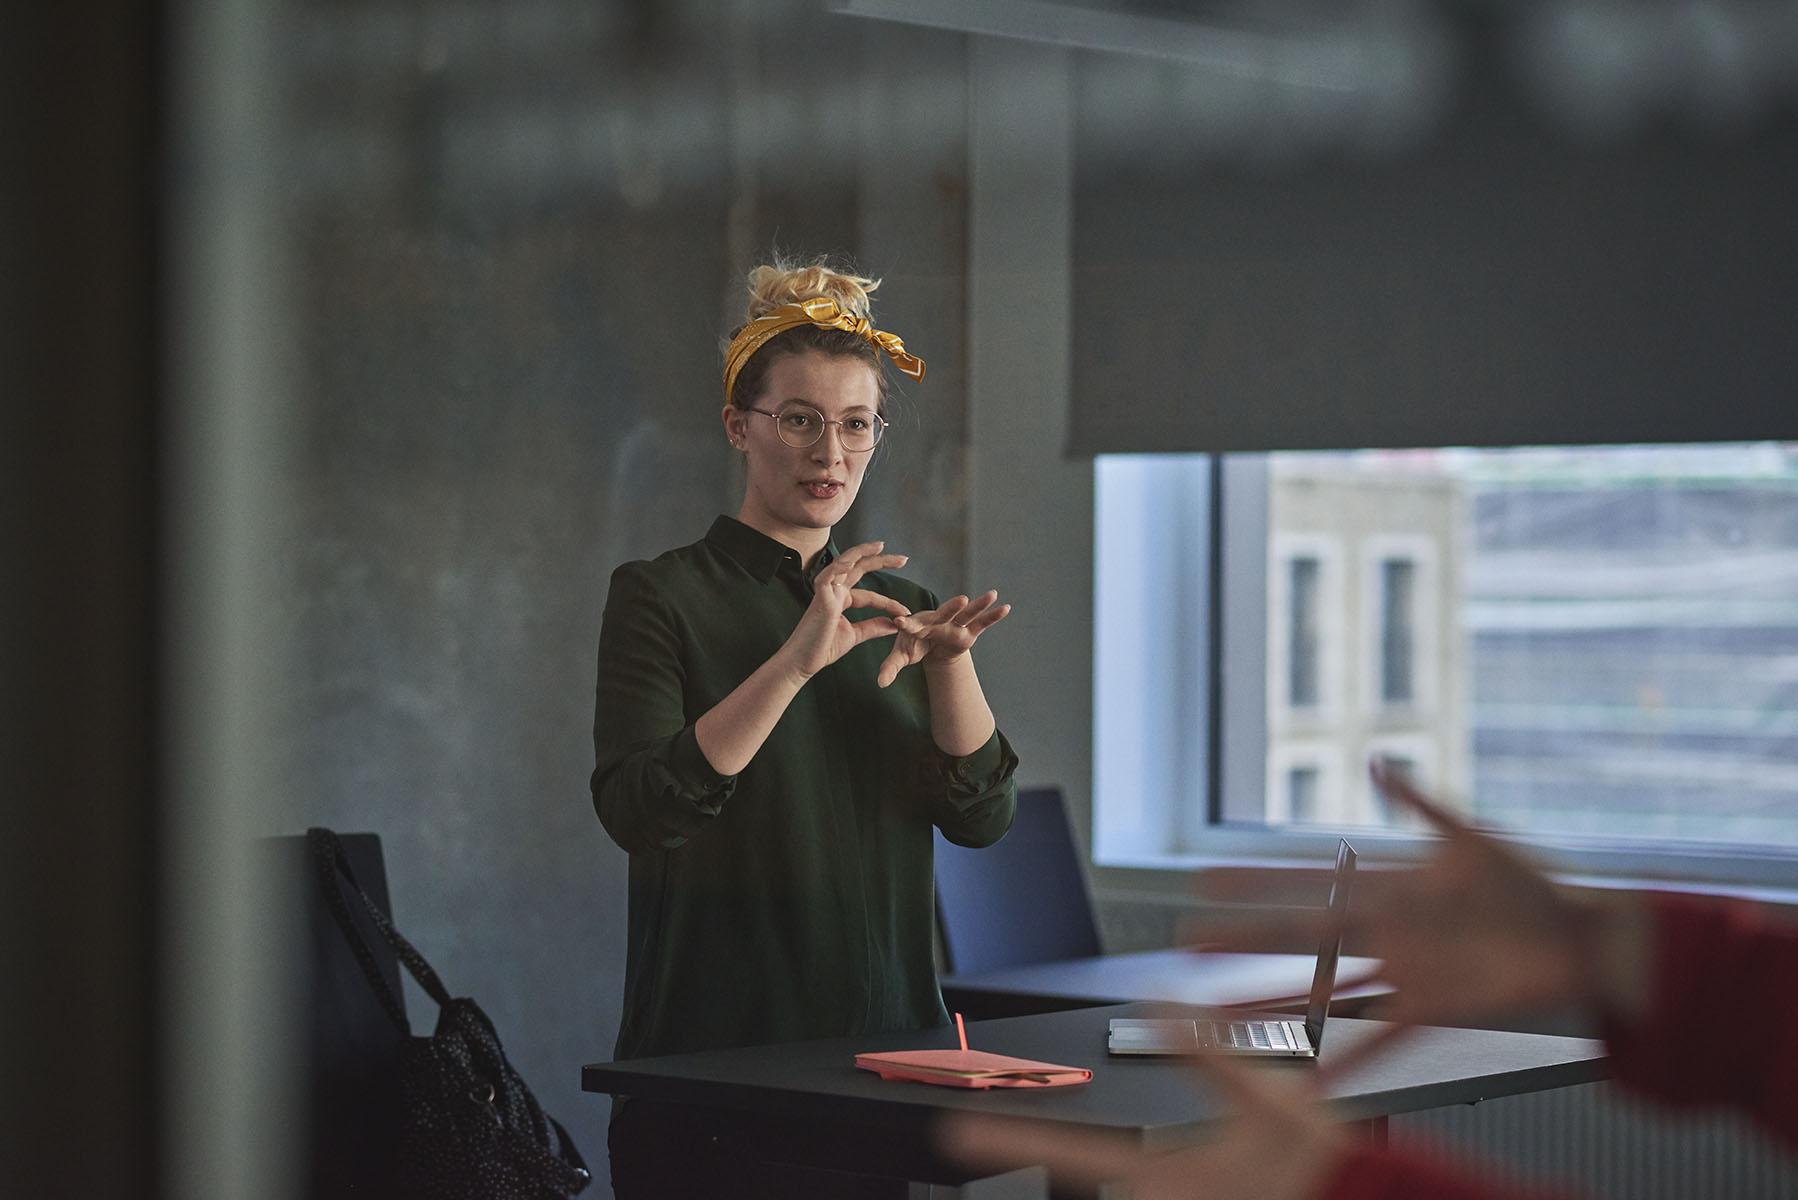 En tegnsprogs- og skrivetolk underviser i tegnsprog i et klasselokale